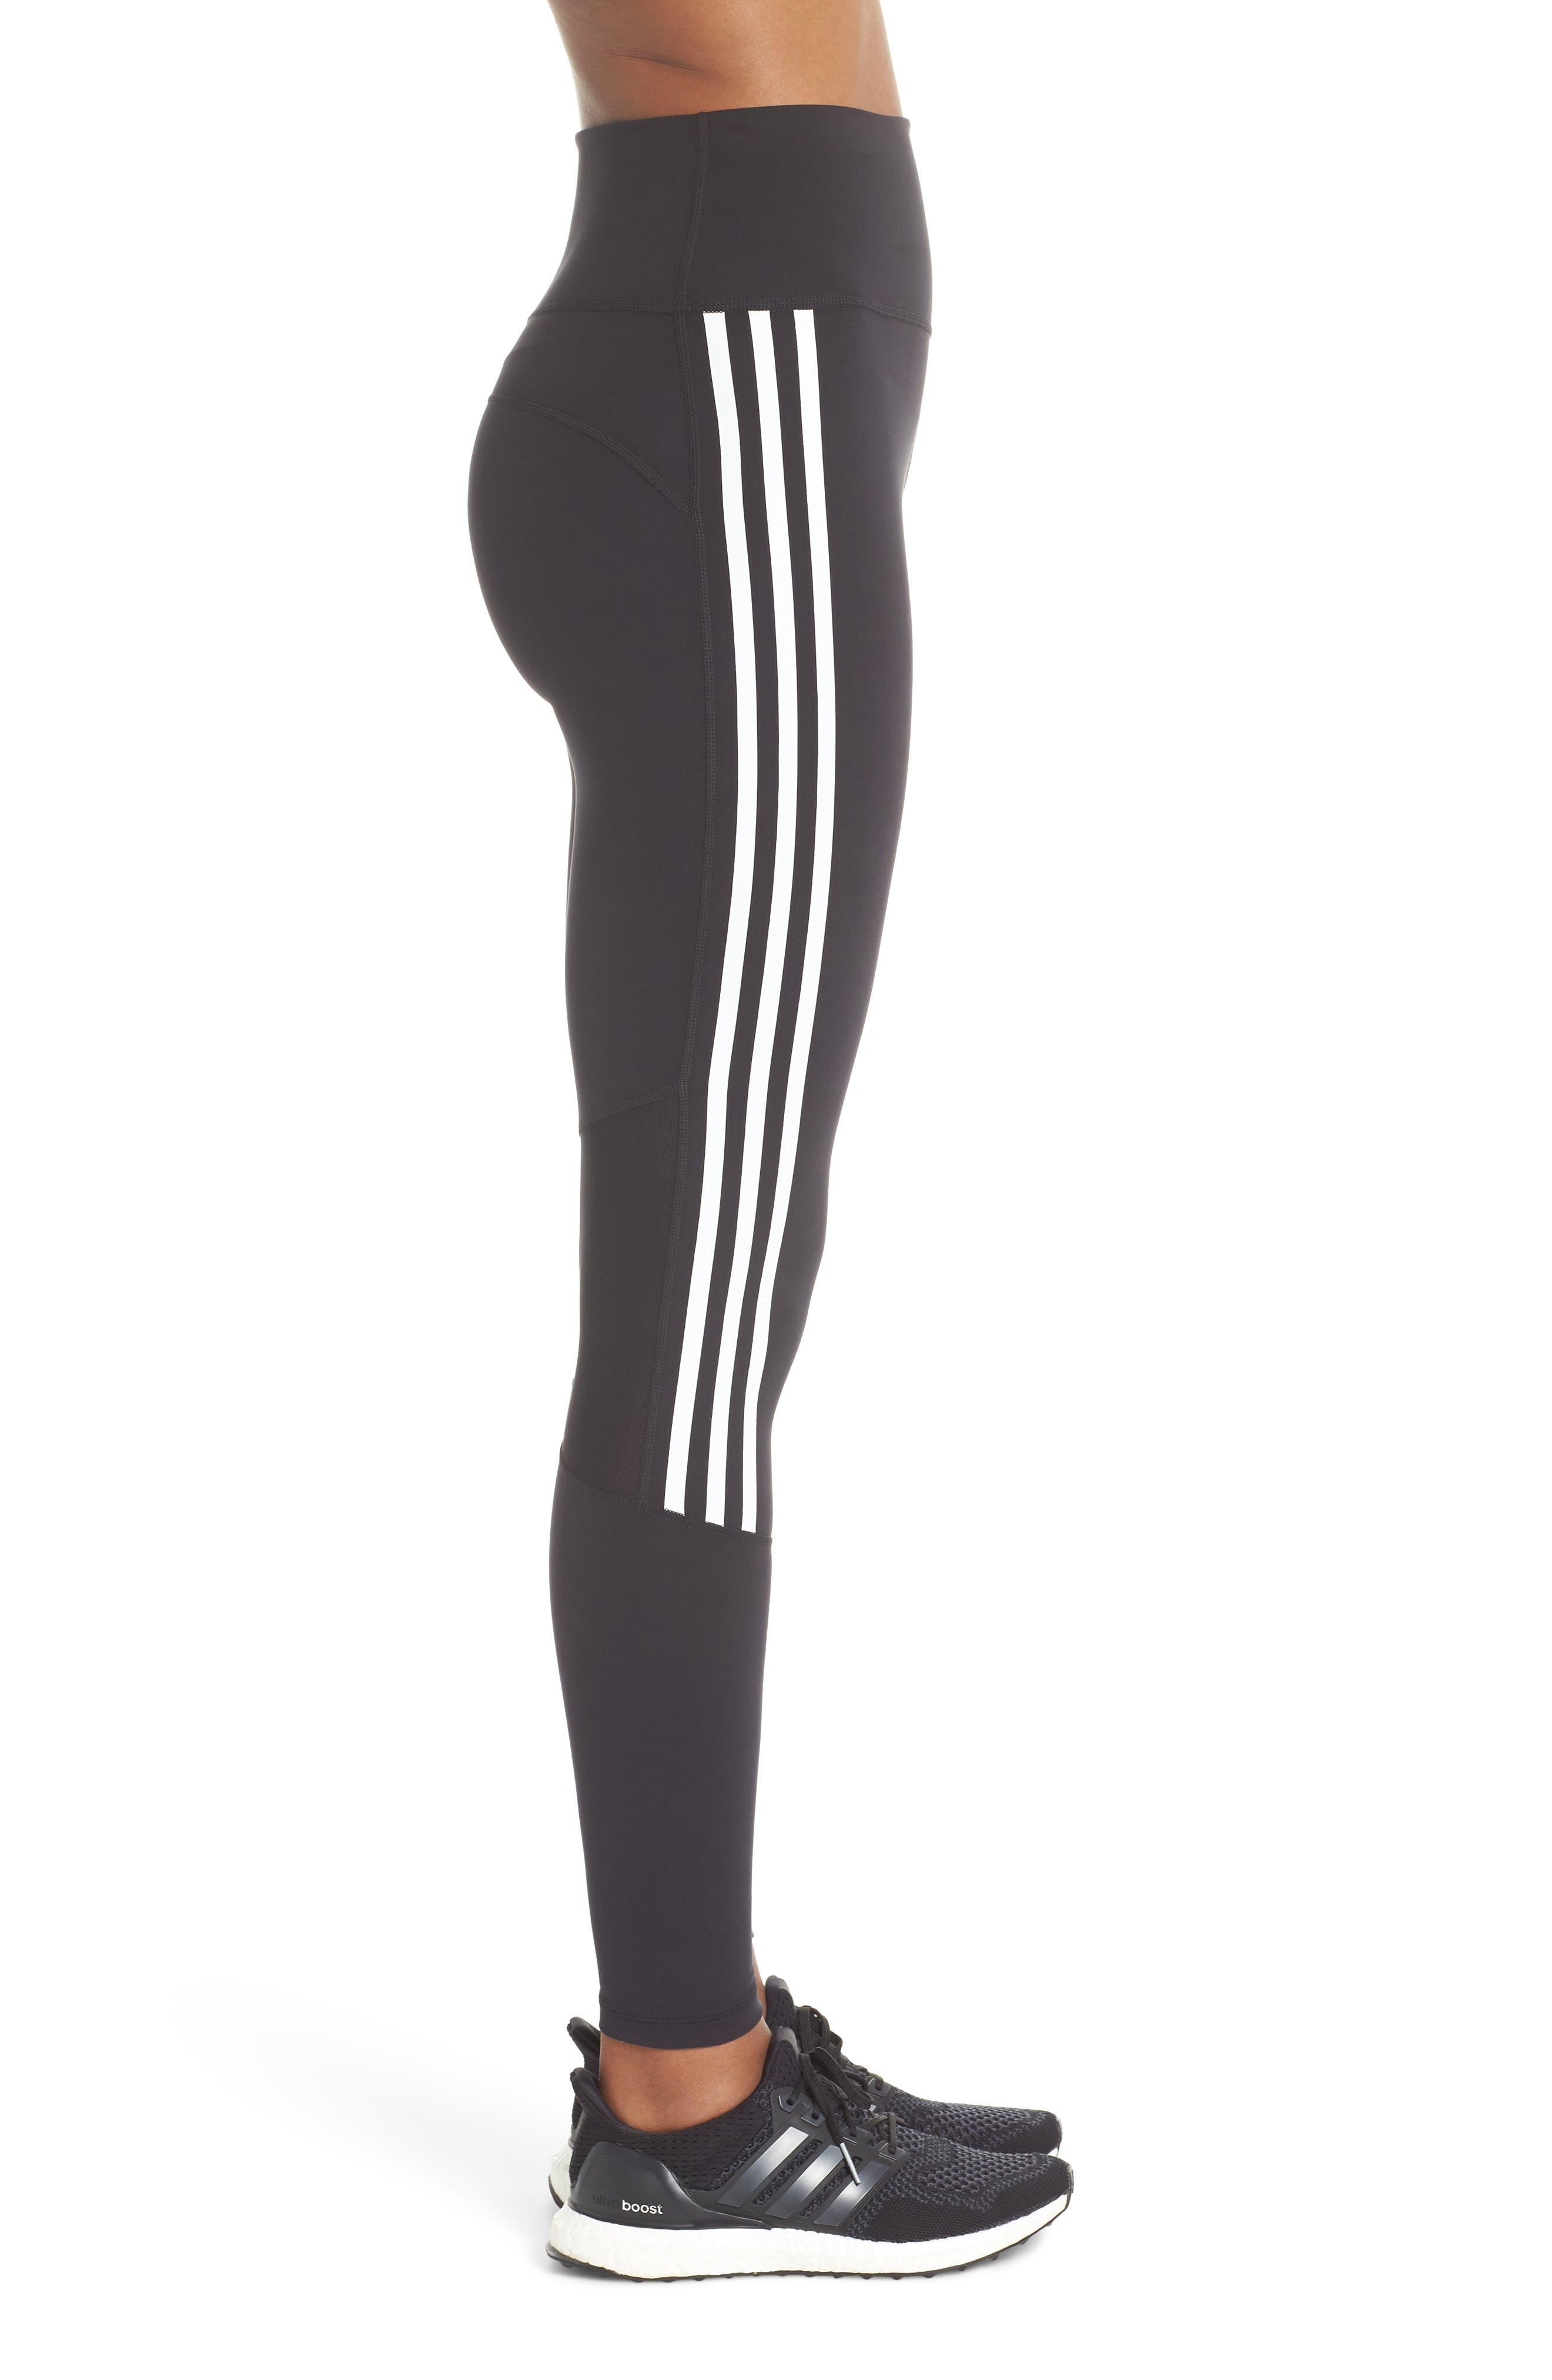 Believe This 3-Stripes High Waist Ankle Leggings,                             Alternate thumbnail 3, color,                             BLACK/ WHITE